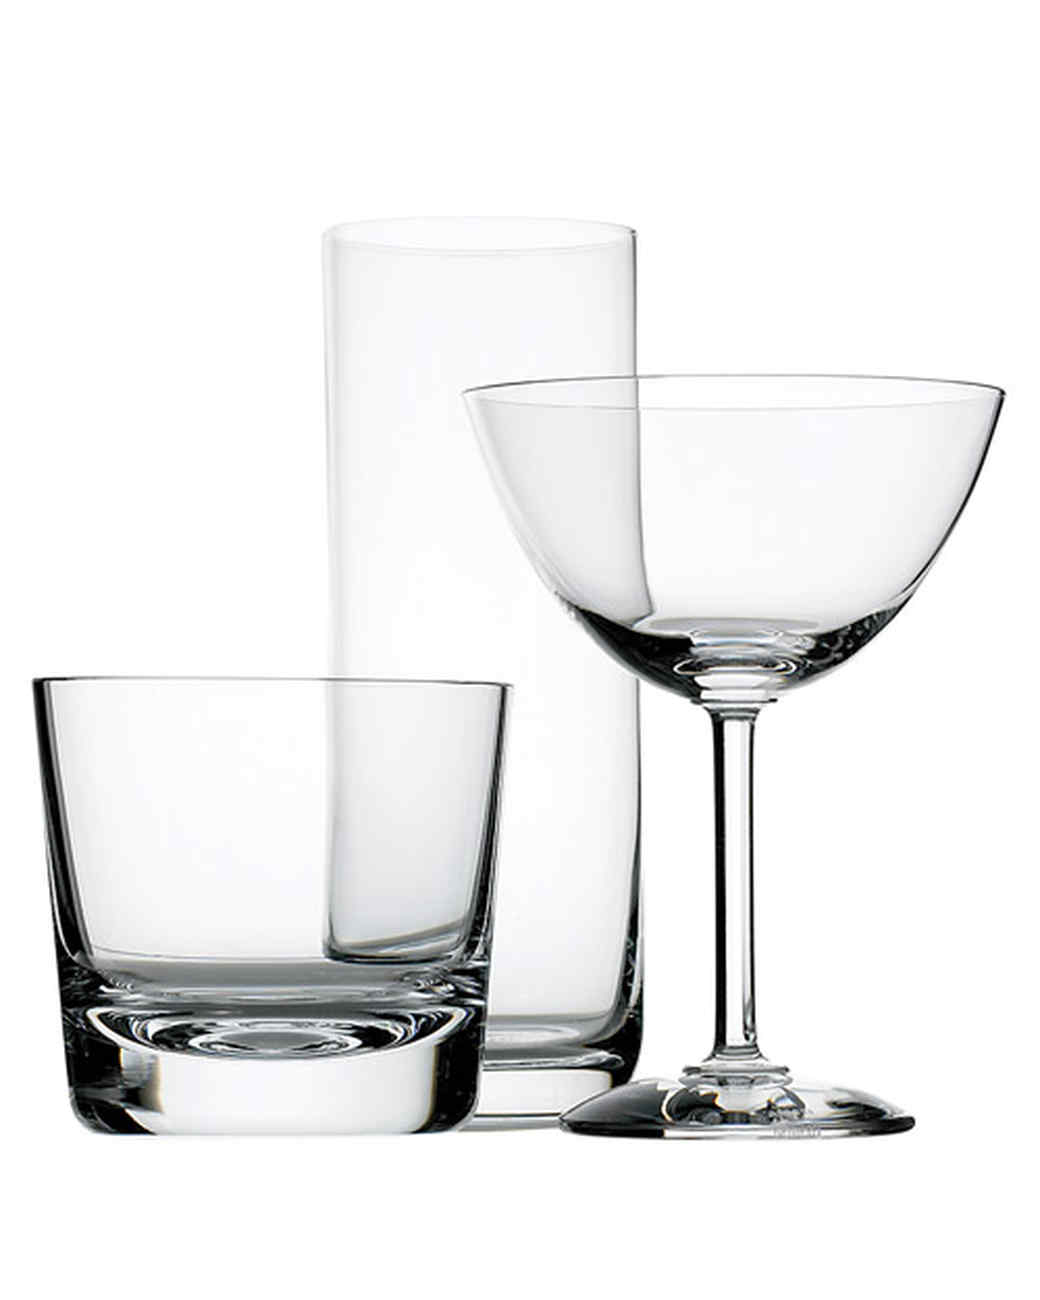 bp_0307_glassware.jpg